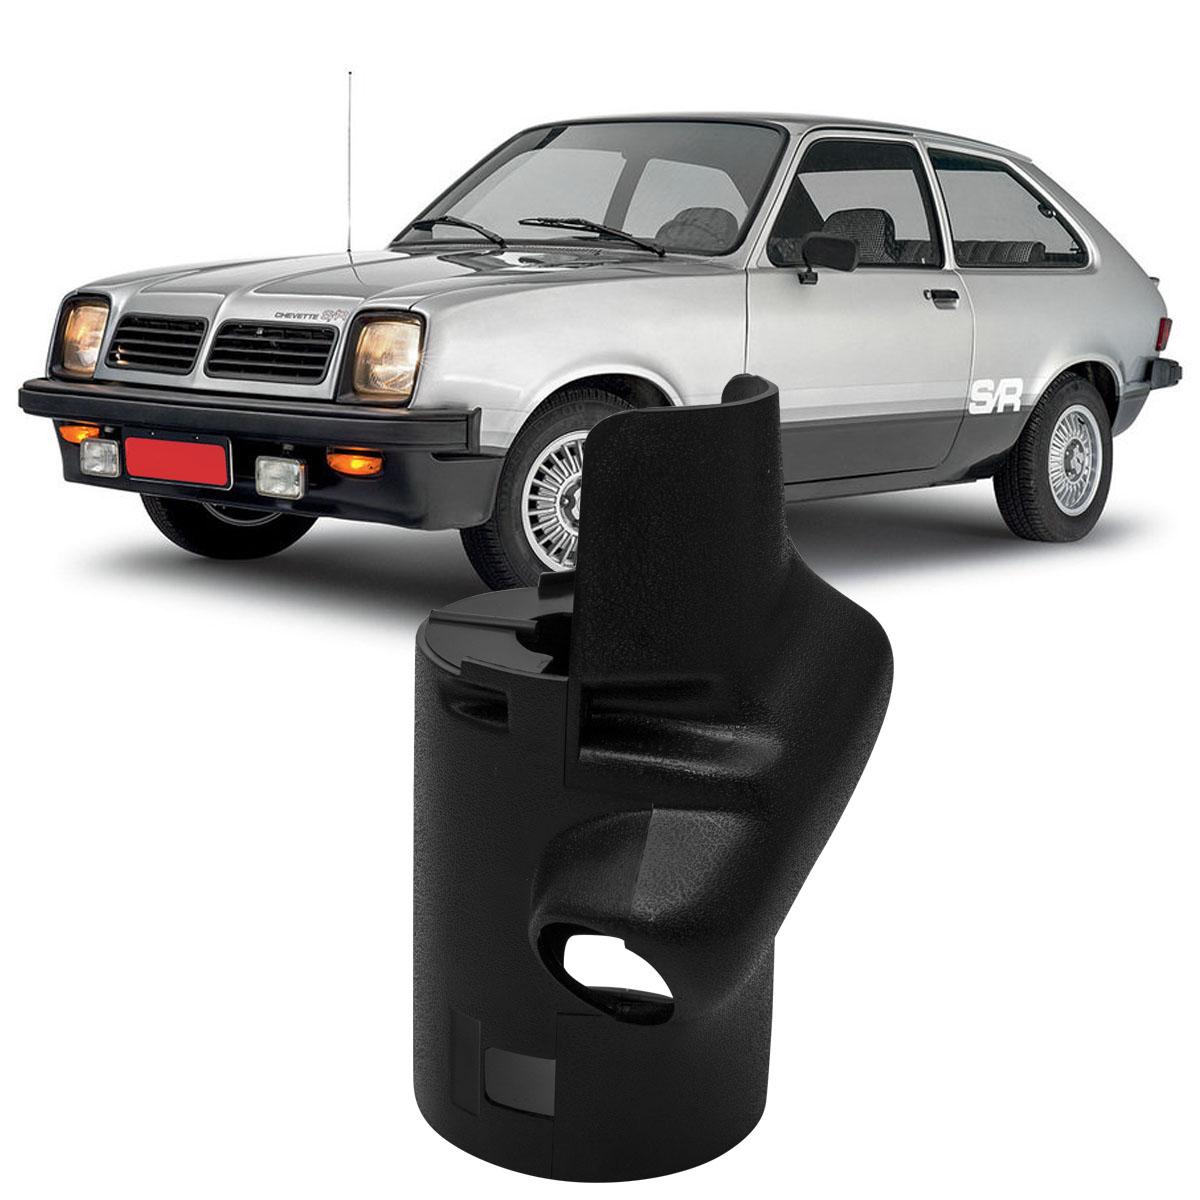 Capa Chave De Seta Chevette Maraj� Chevy 1983 1984 1985 1986